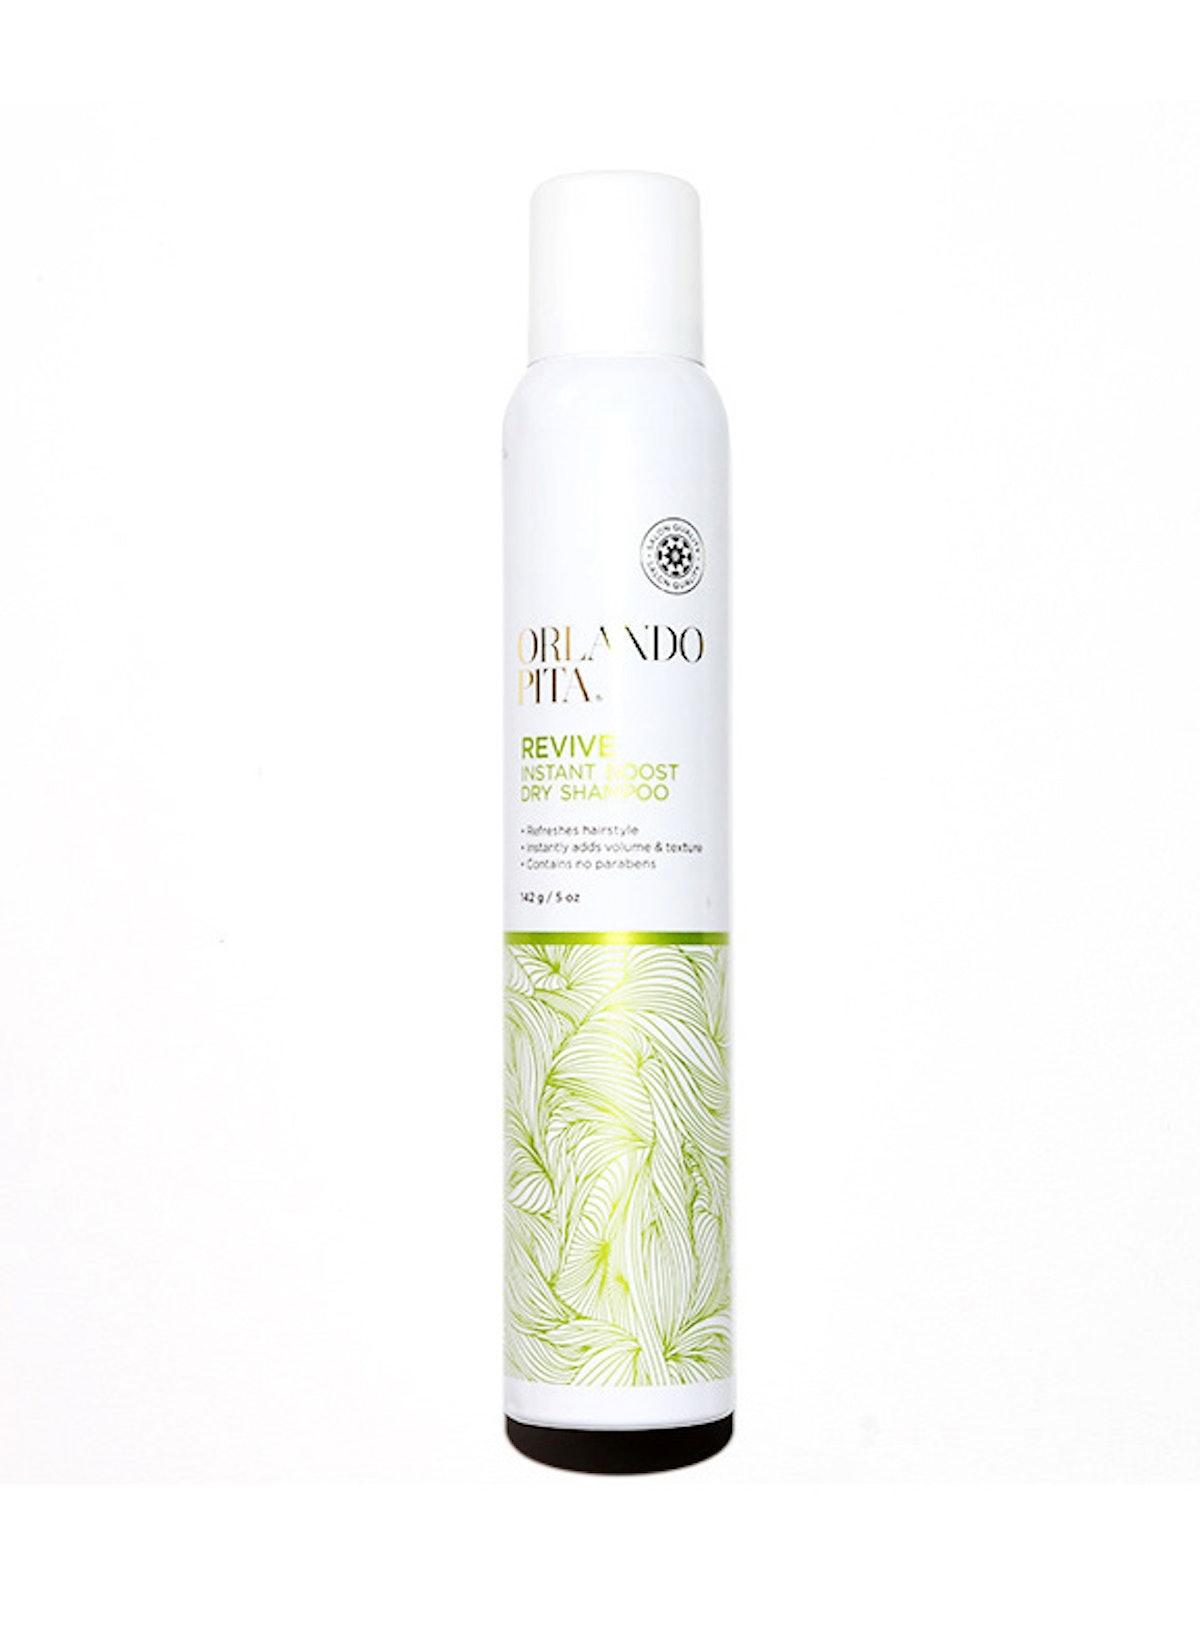 Orlando Pita Revive Instant Boost Dry Shampoo